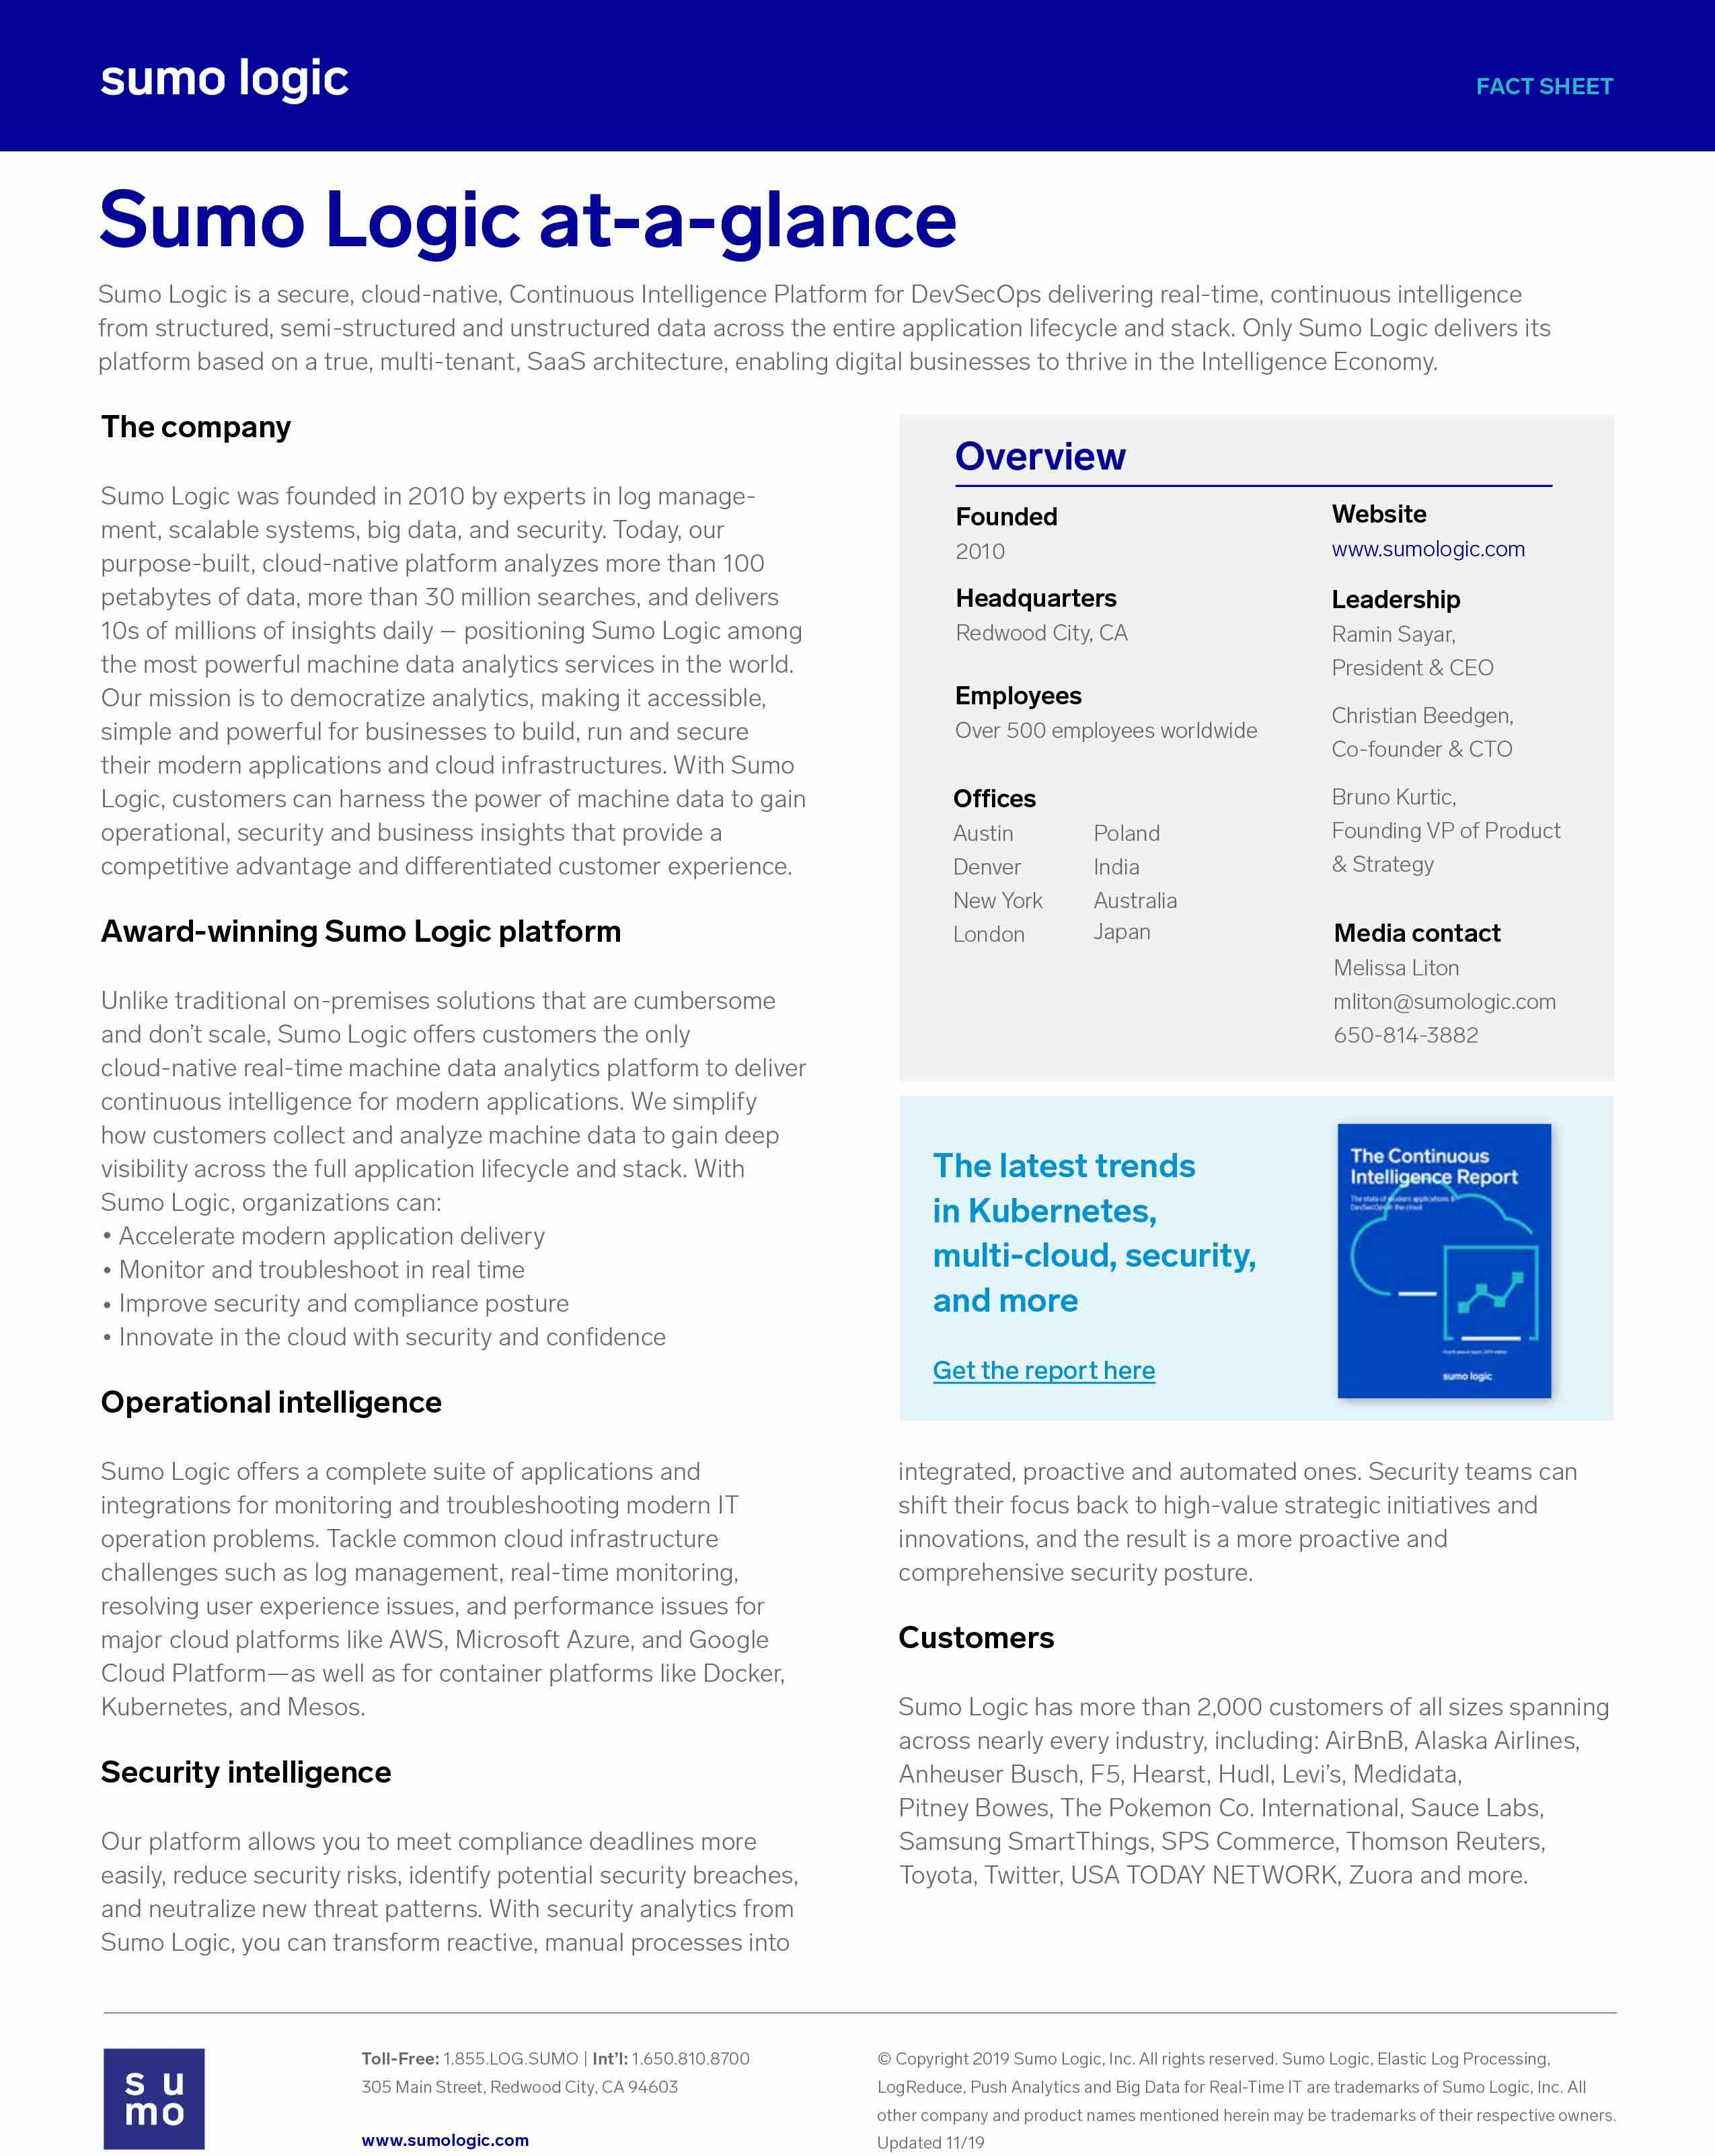 Sumo Logic At-a-Glance